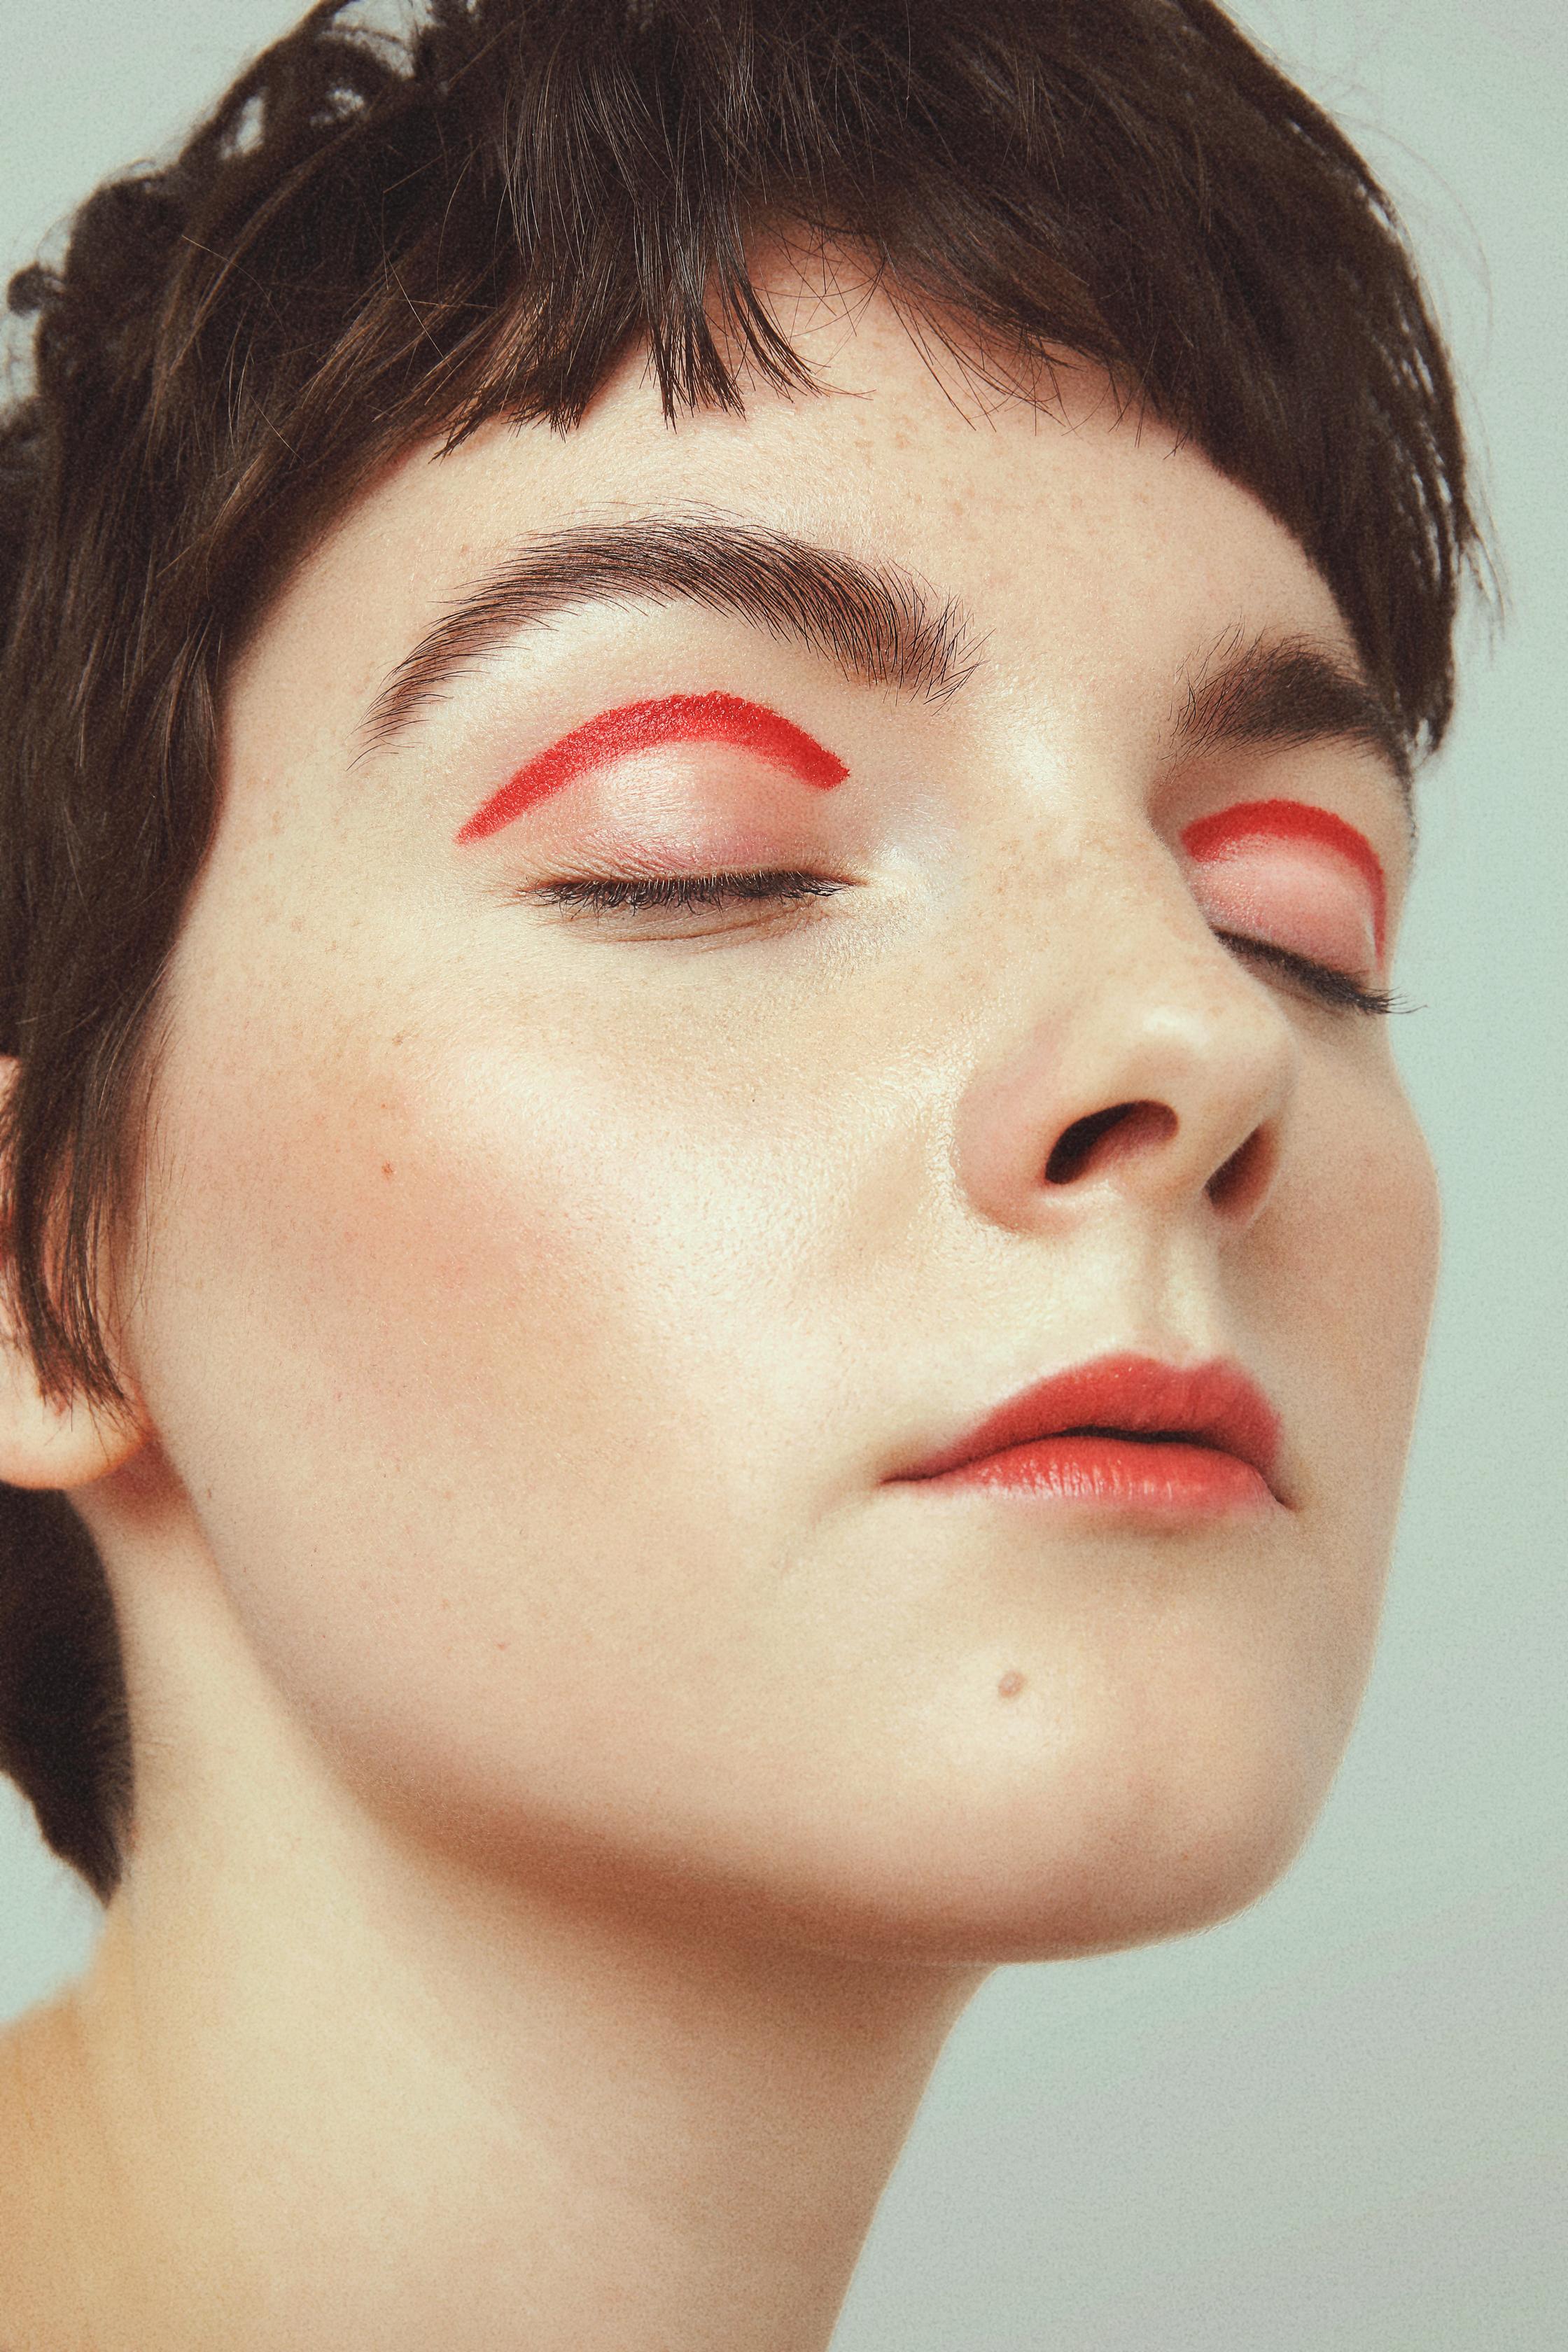 Photographer: Jannik Hanne | Model: Magali Bührmann